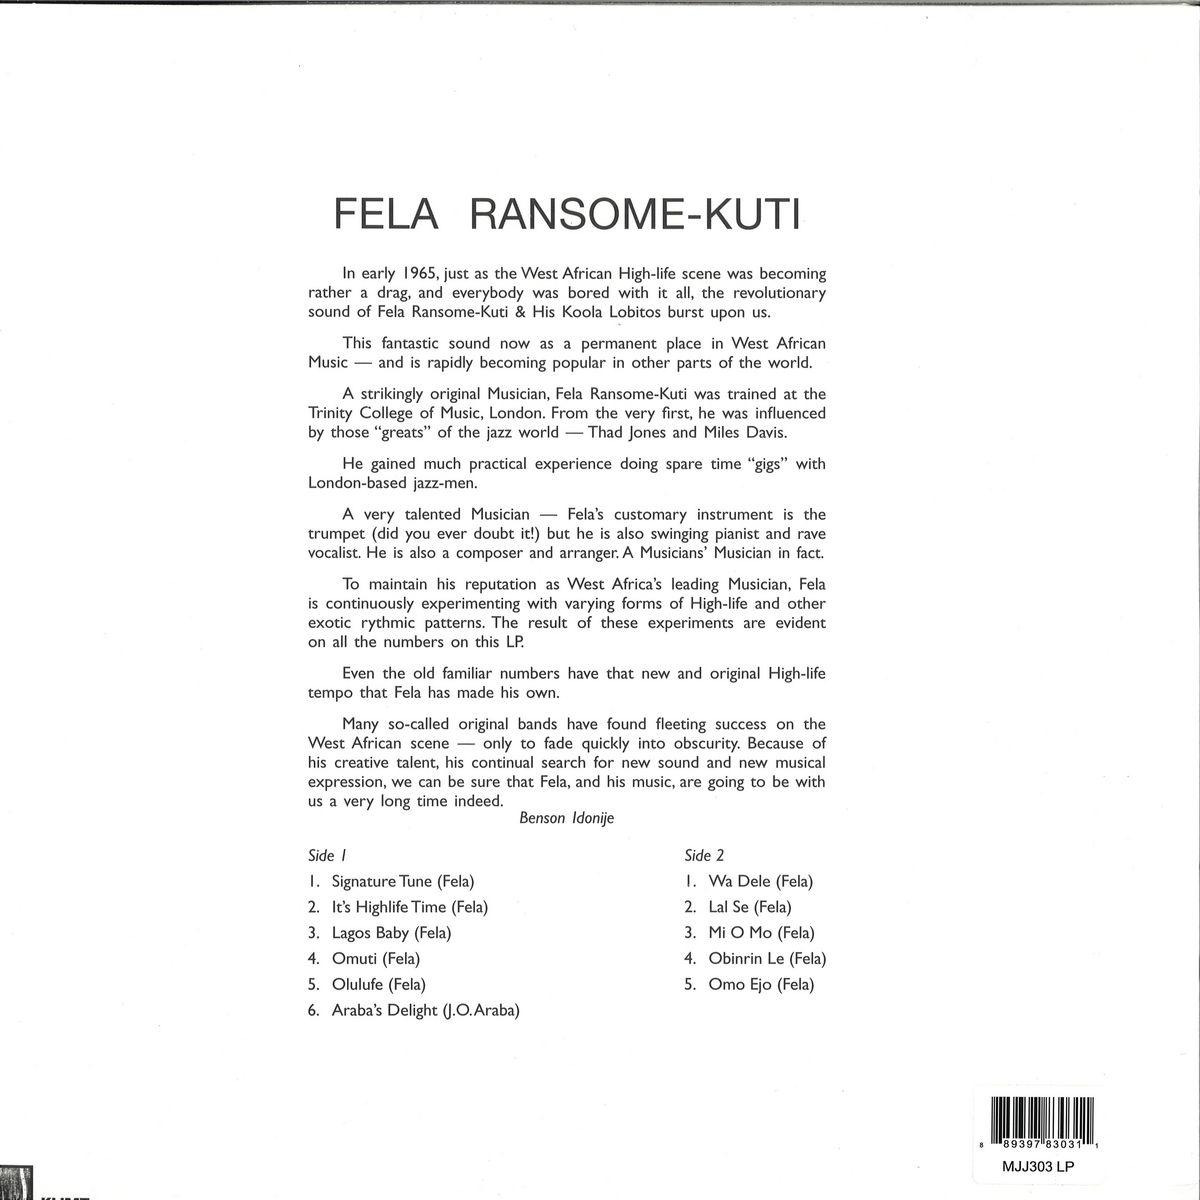 Fela Ransome Kuti And His Koola Lobitos - LP